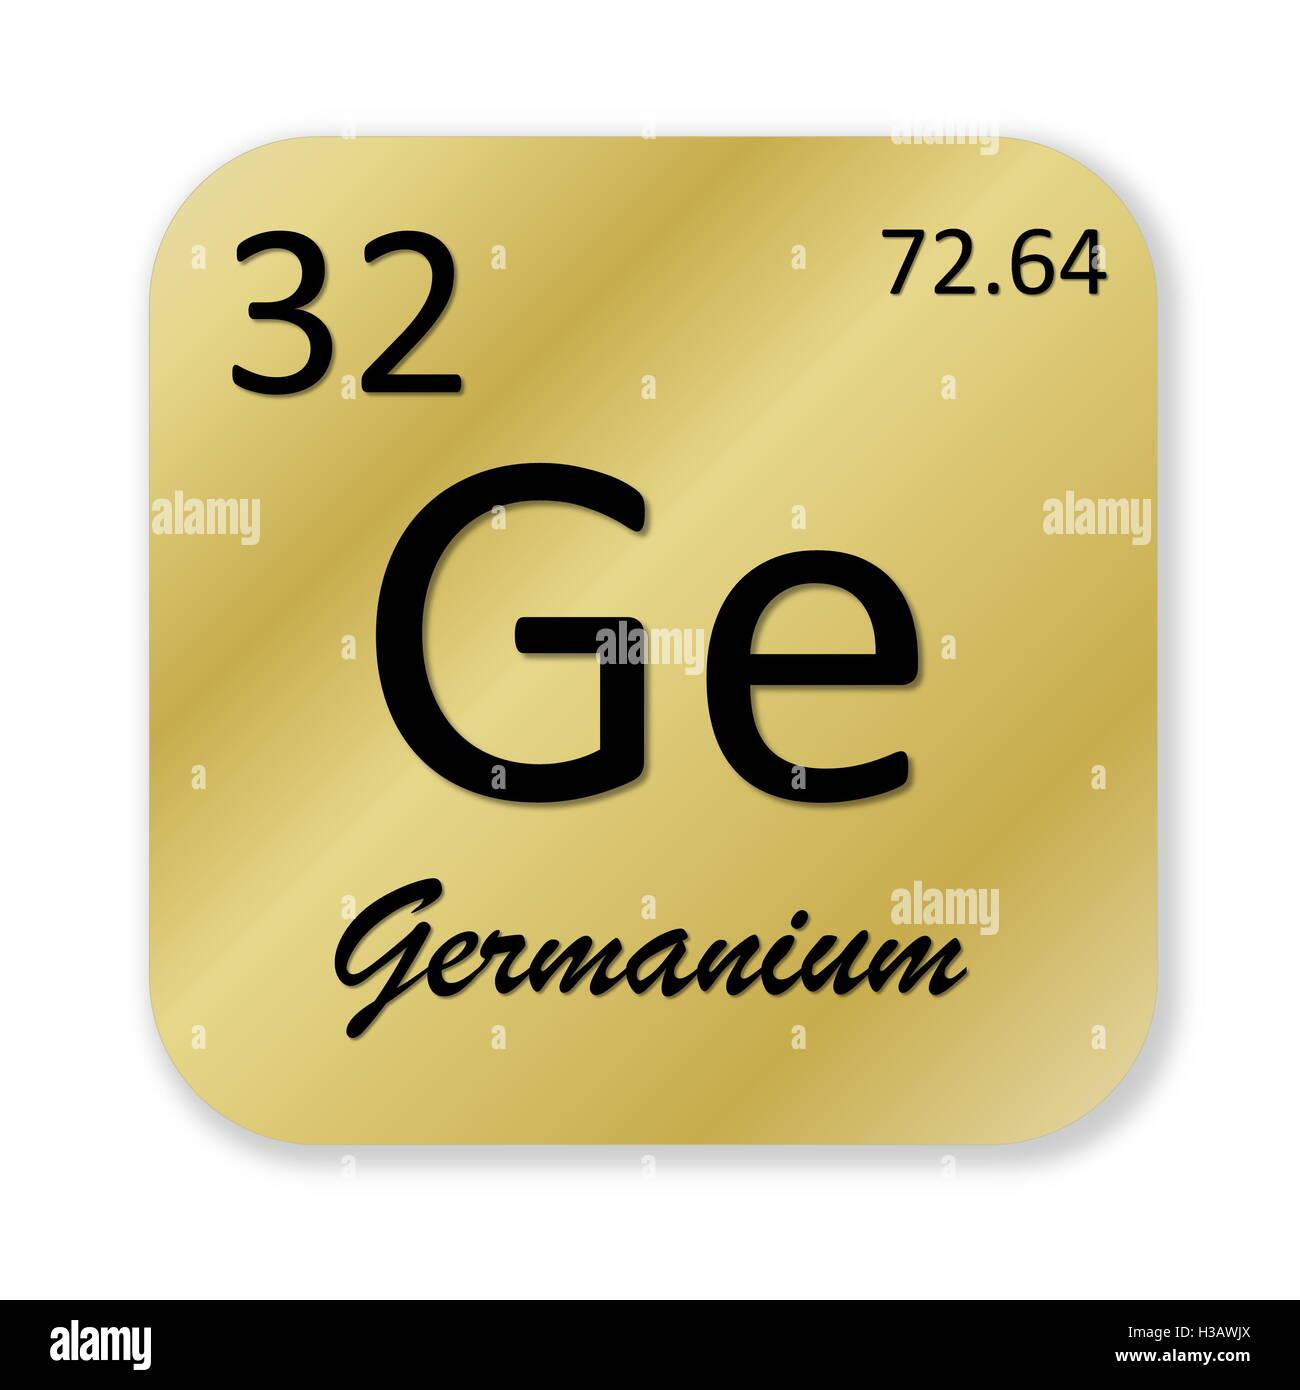 Germanium Element Stock Photo 122556194 Alamy